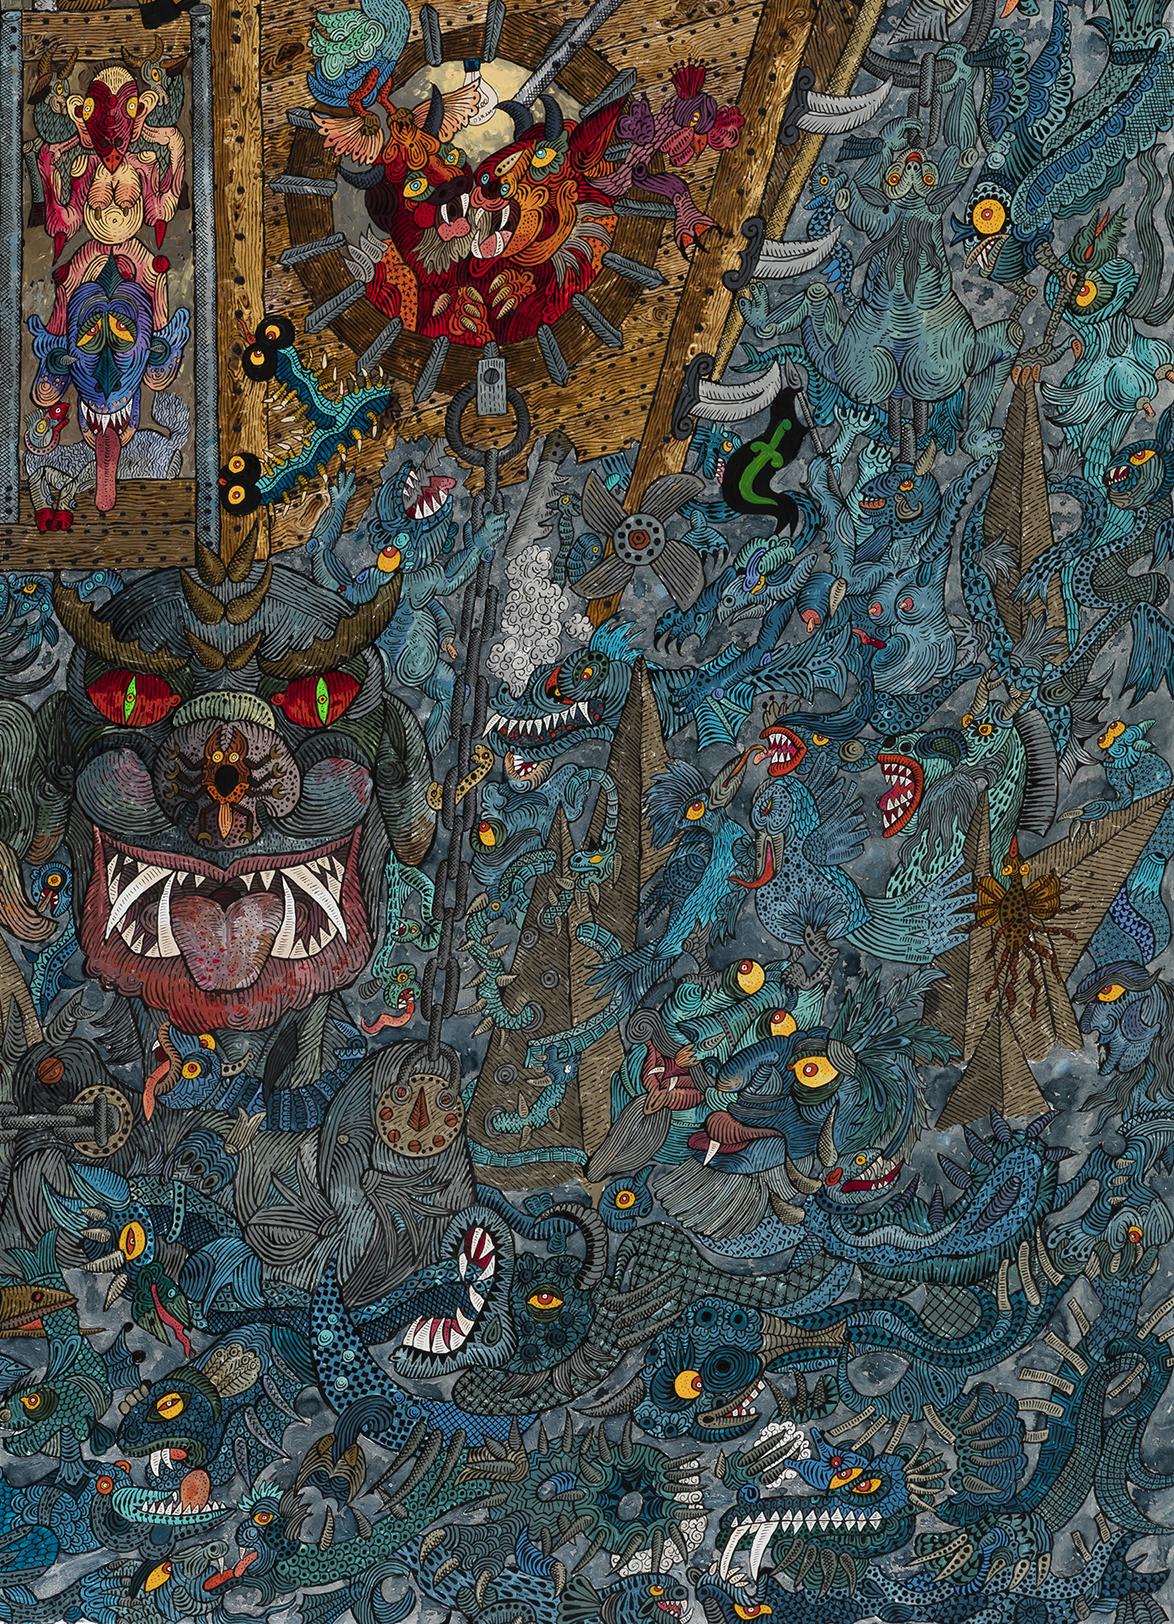 Ali Akbar Sadeghi - As Demon Noah, detail 4